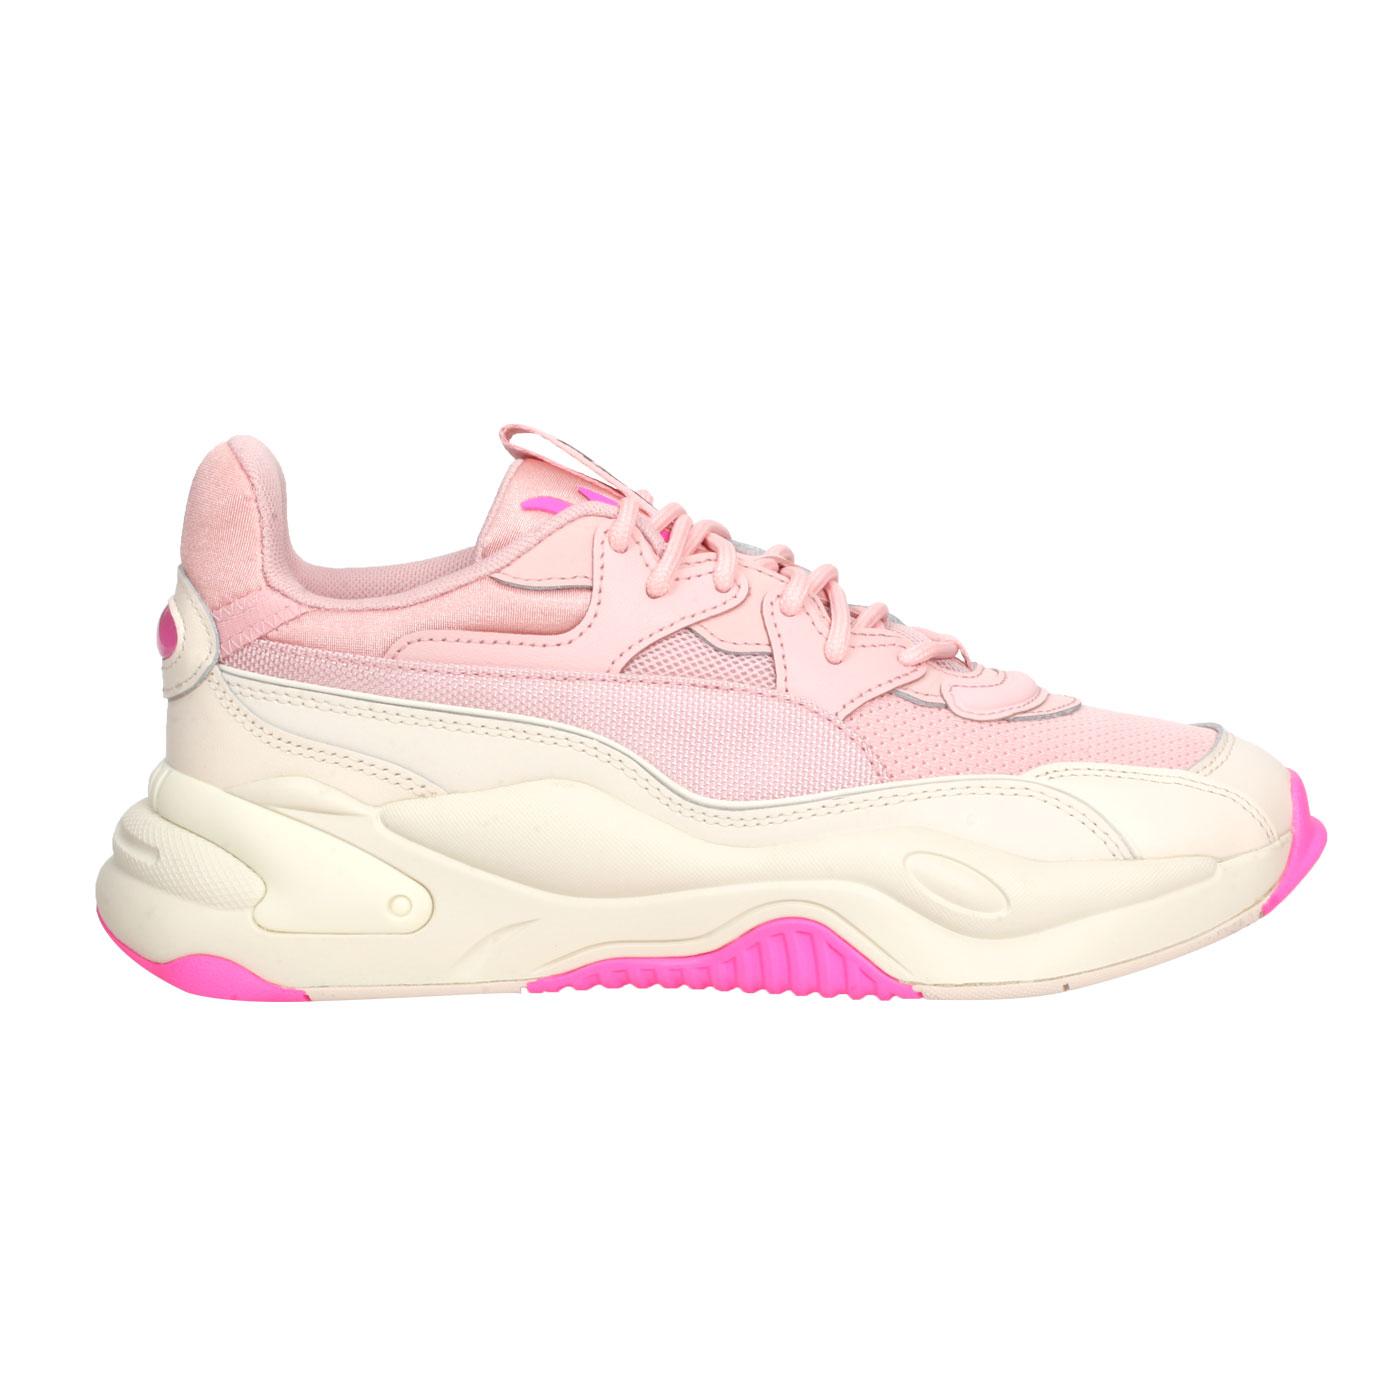 PUMA 女款復古運動鞋  @RS-2K Streaming@37331104 - 粉桃紅米白